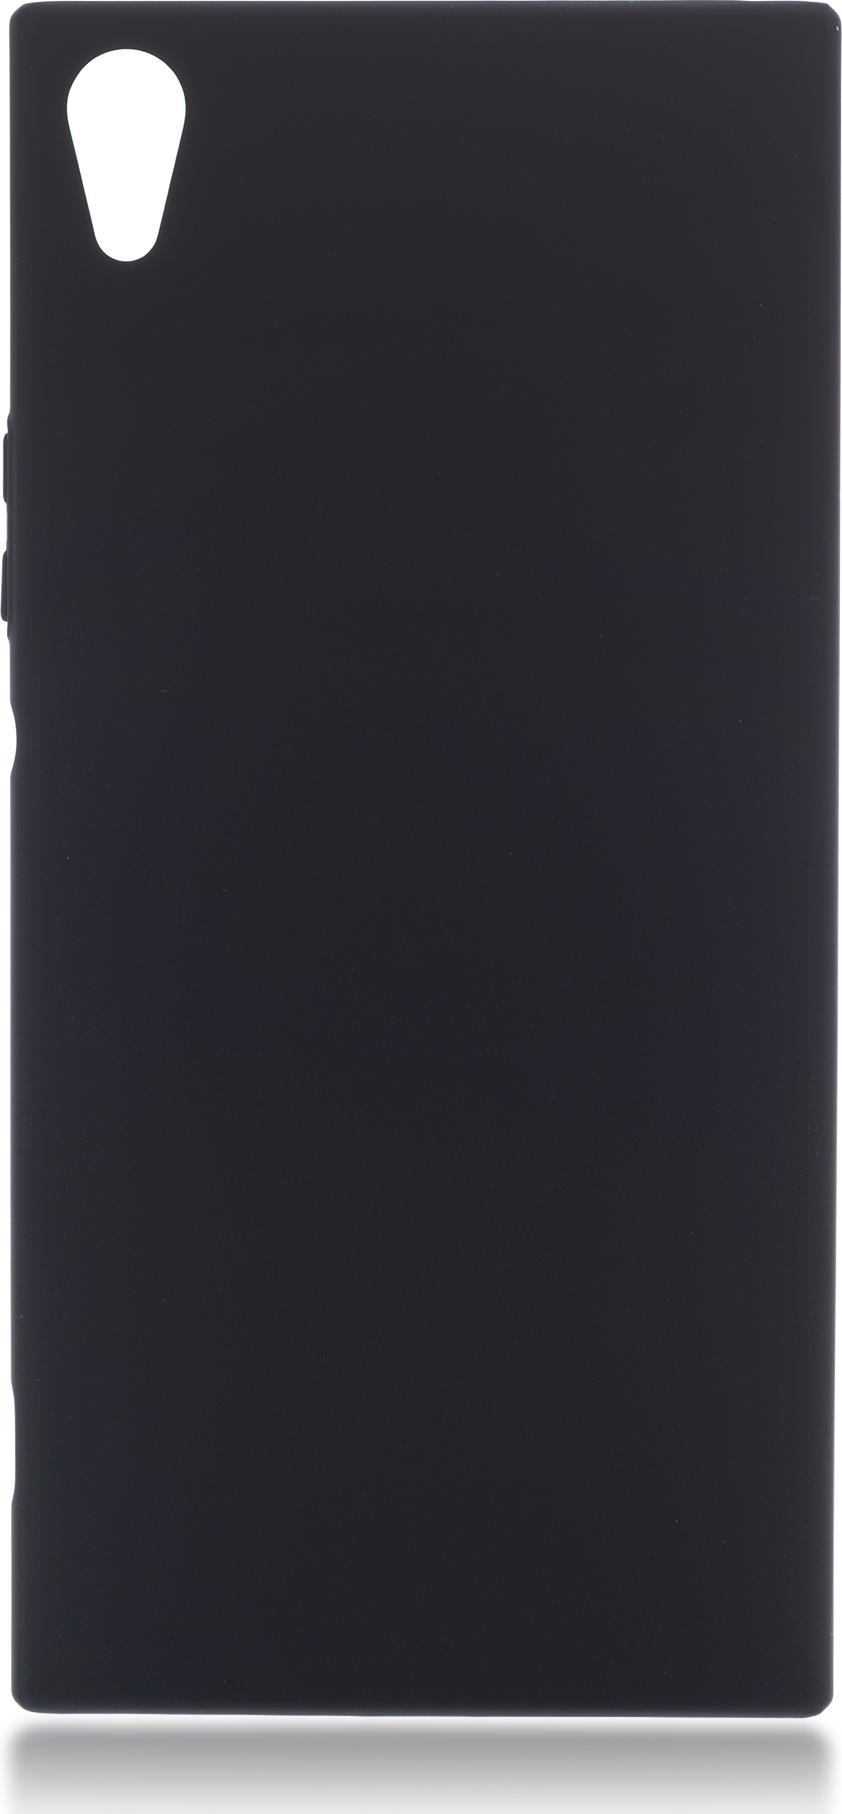 Чехол Brosco 4Side Soft-Touch для Sony Xperia XA1 Ultra, черный цена